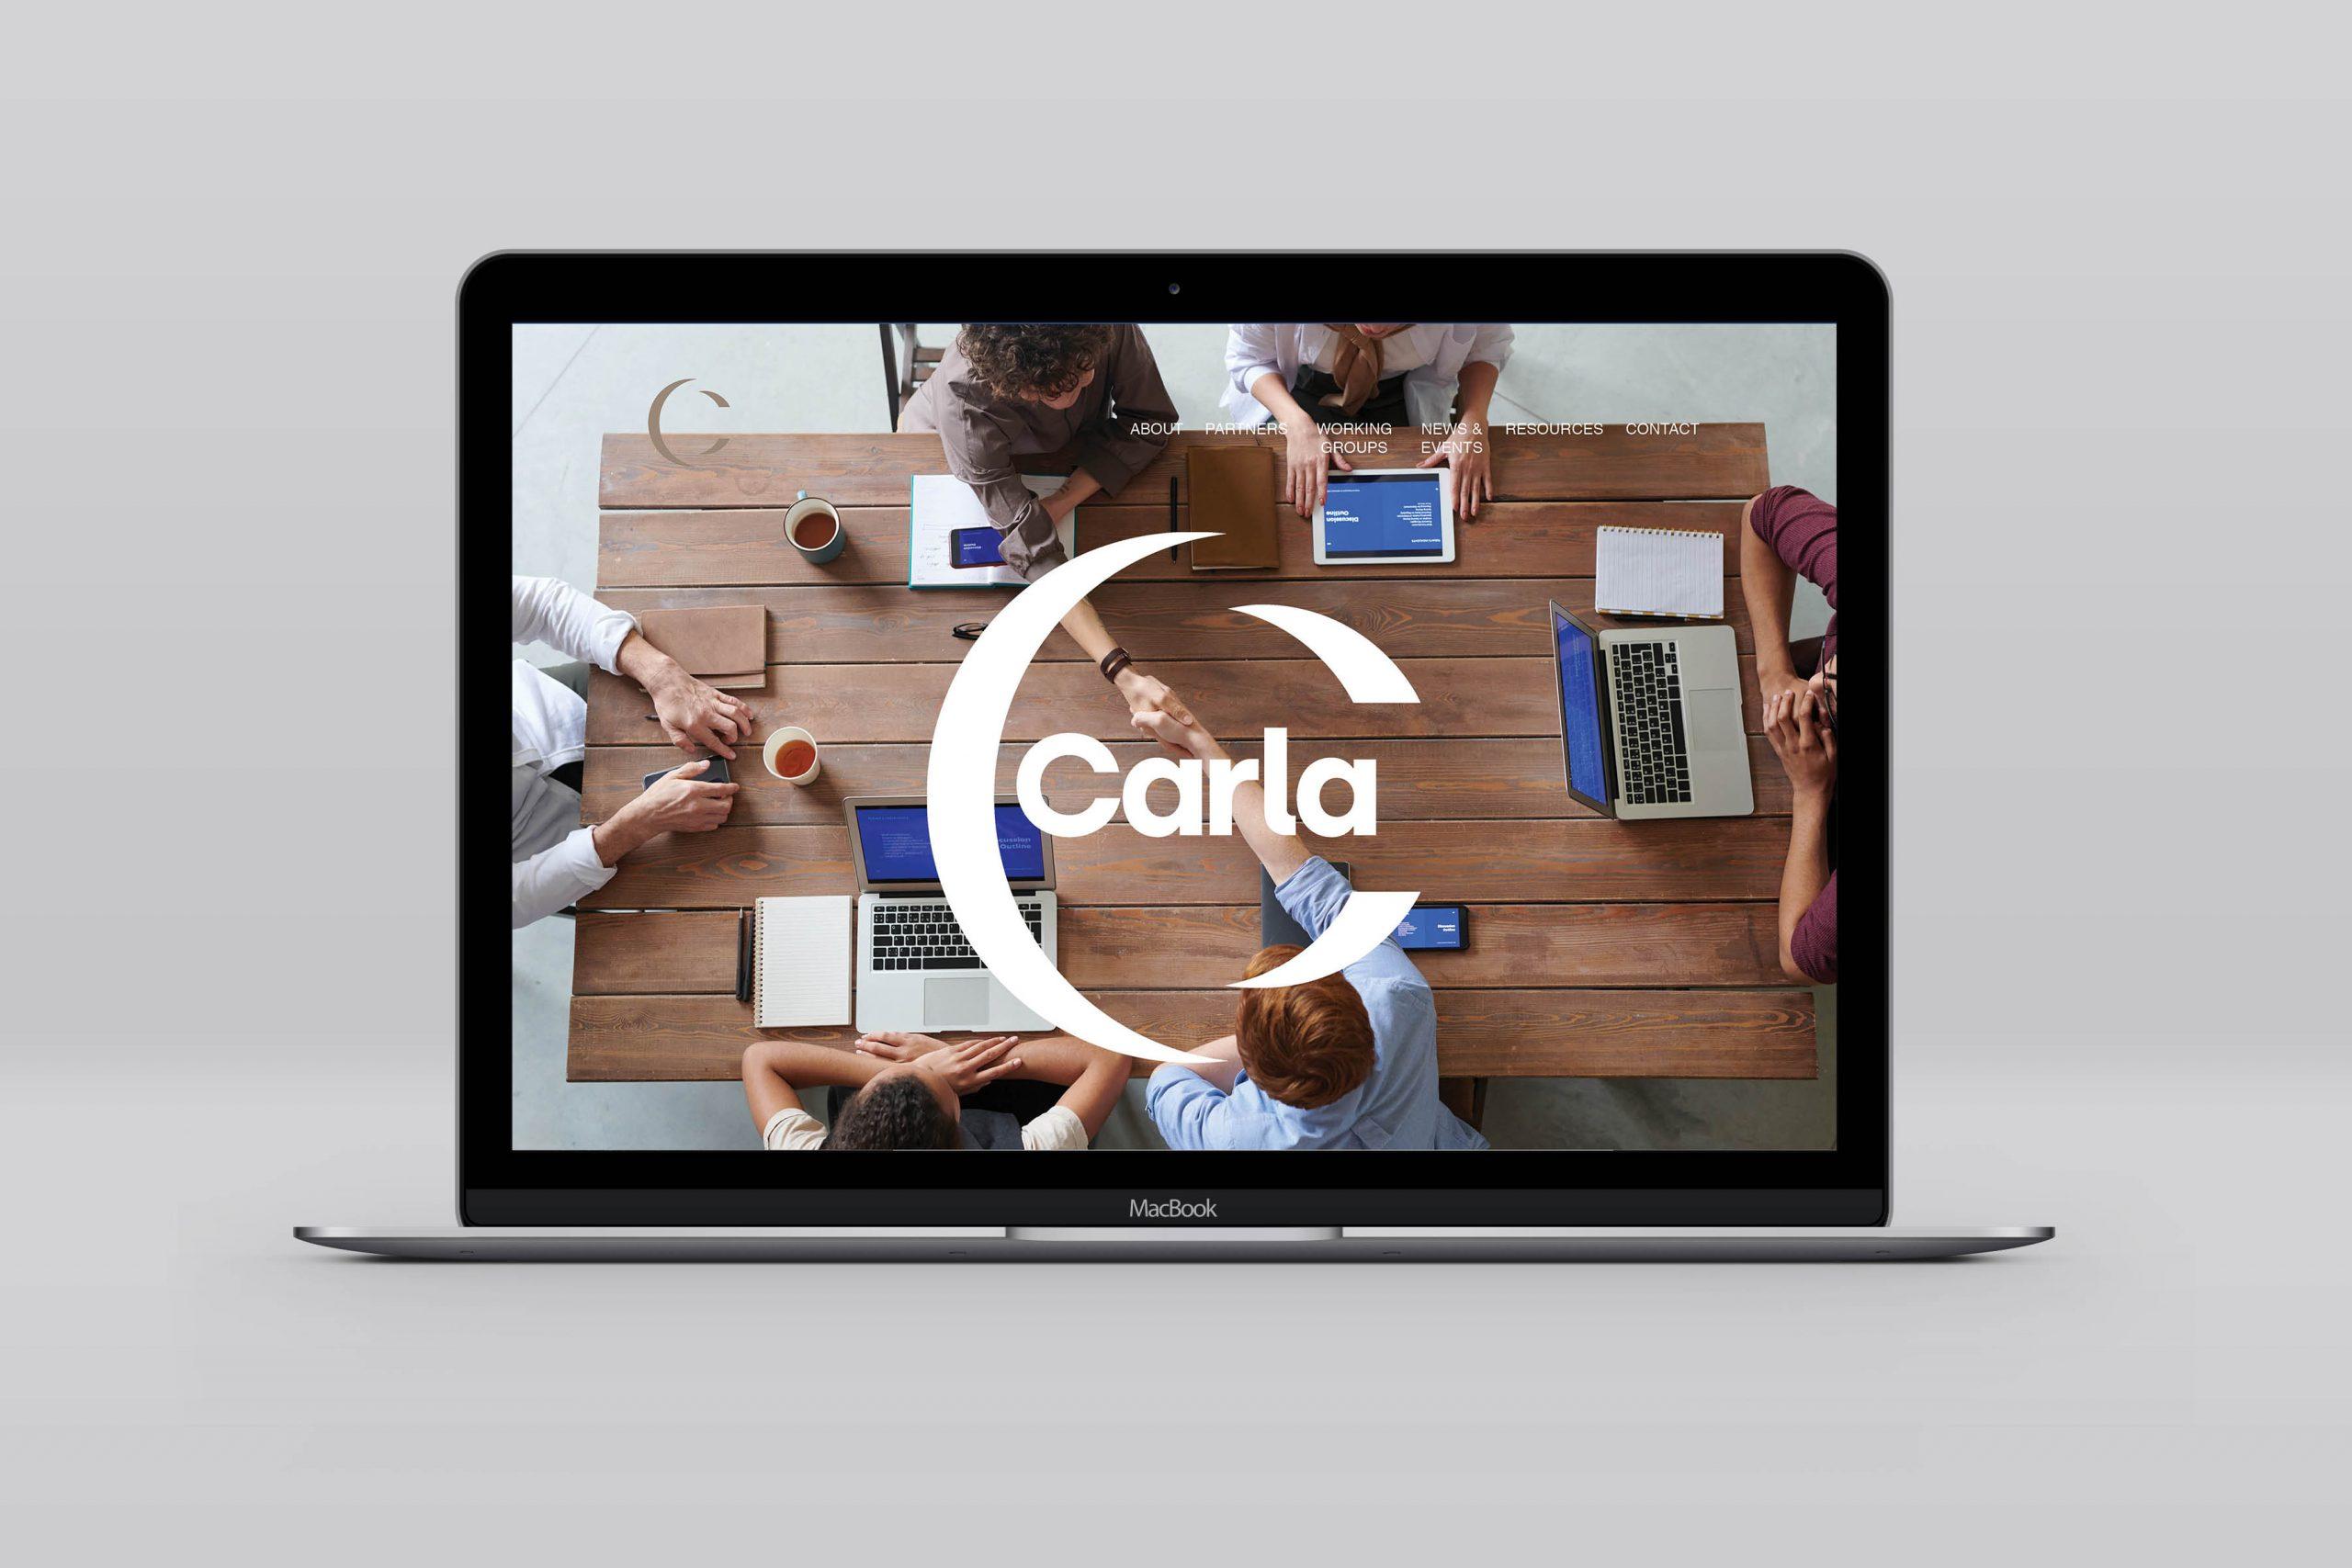 Carla_MacBook-Daniel-Cavalcanti-1